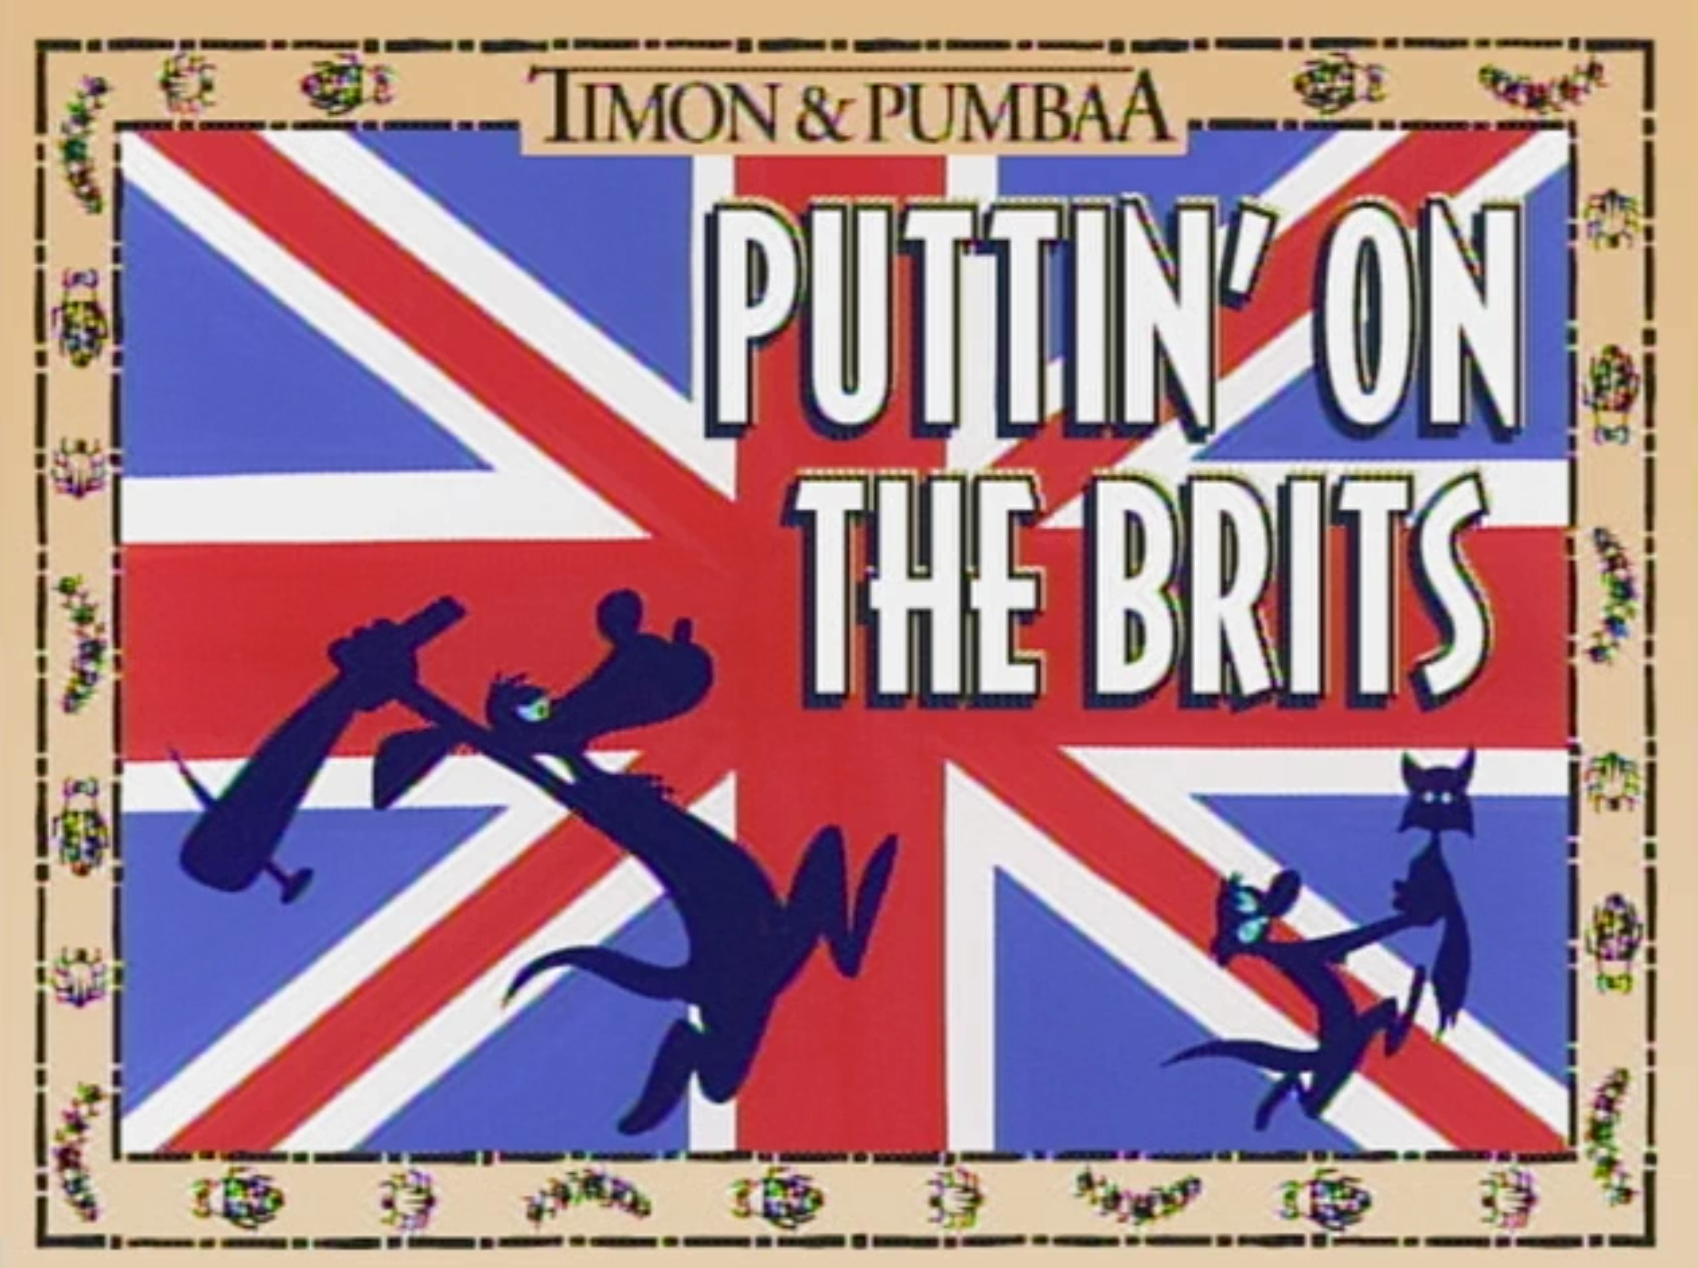 Puttin' on the Brits